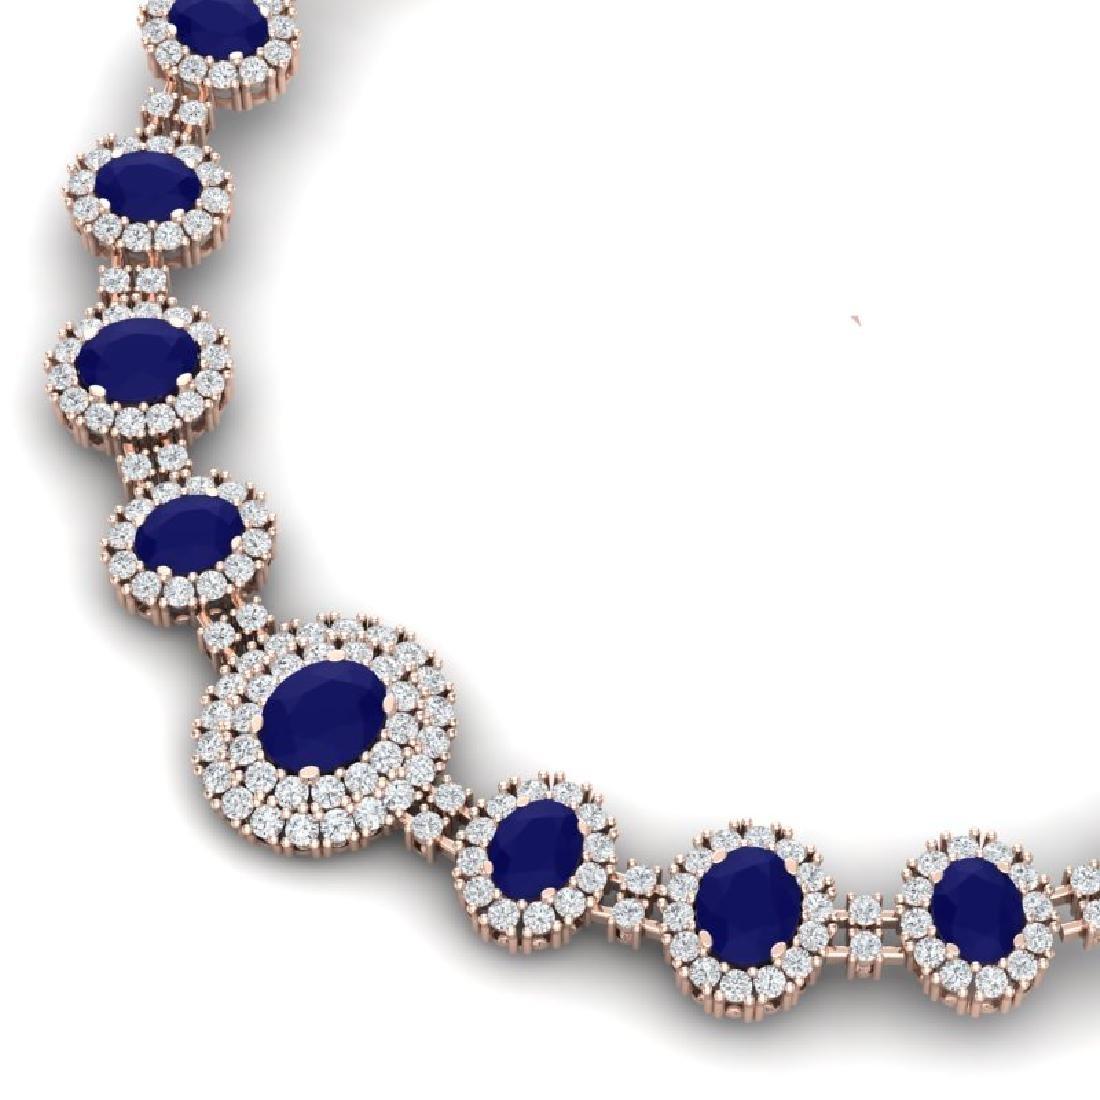 45.69 CTW Royalty Sapphire & VS Diamond Necklace 18K - 2